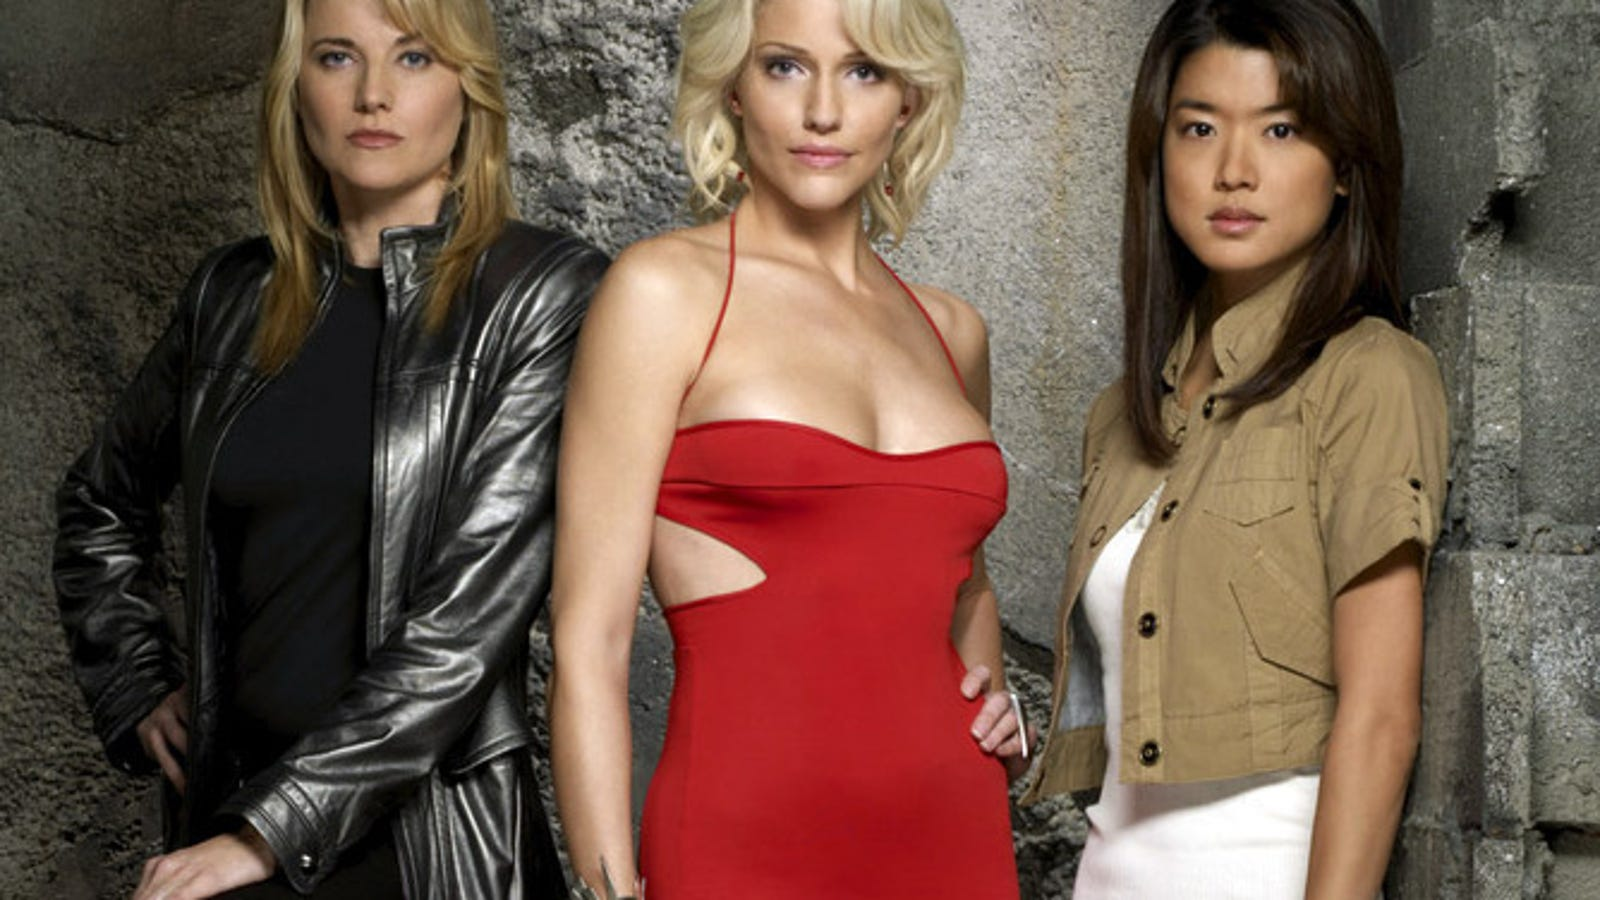 New Cast Photos From Battlestar Galactica Season 4